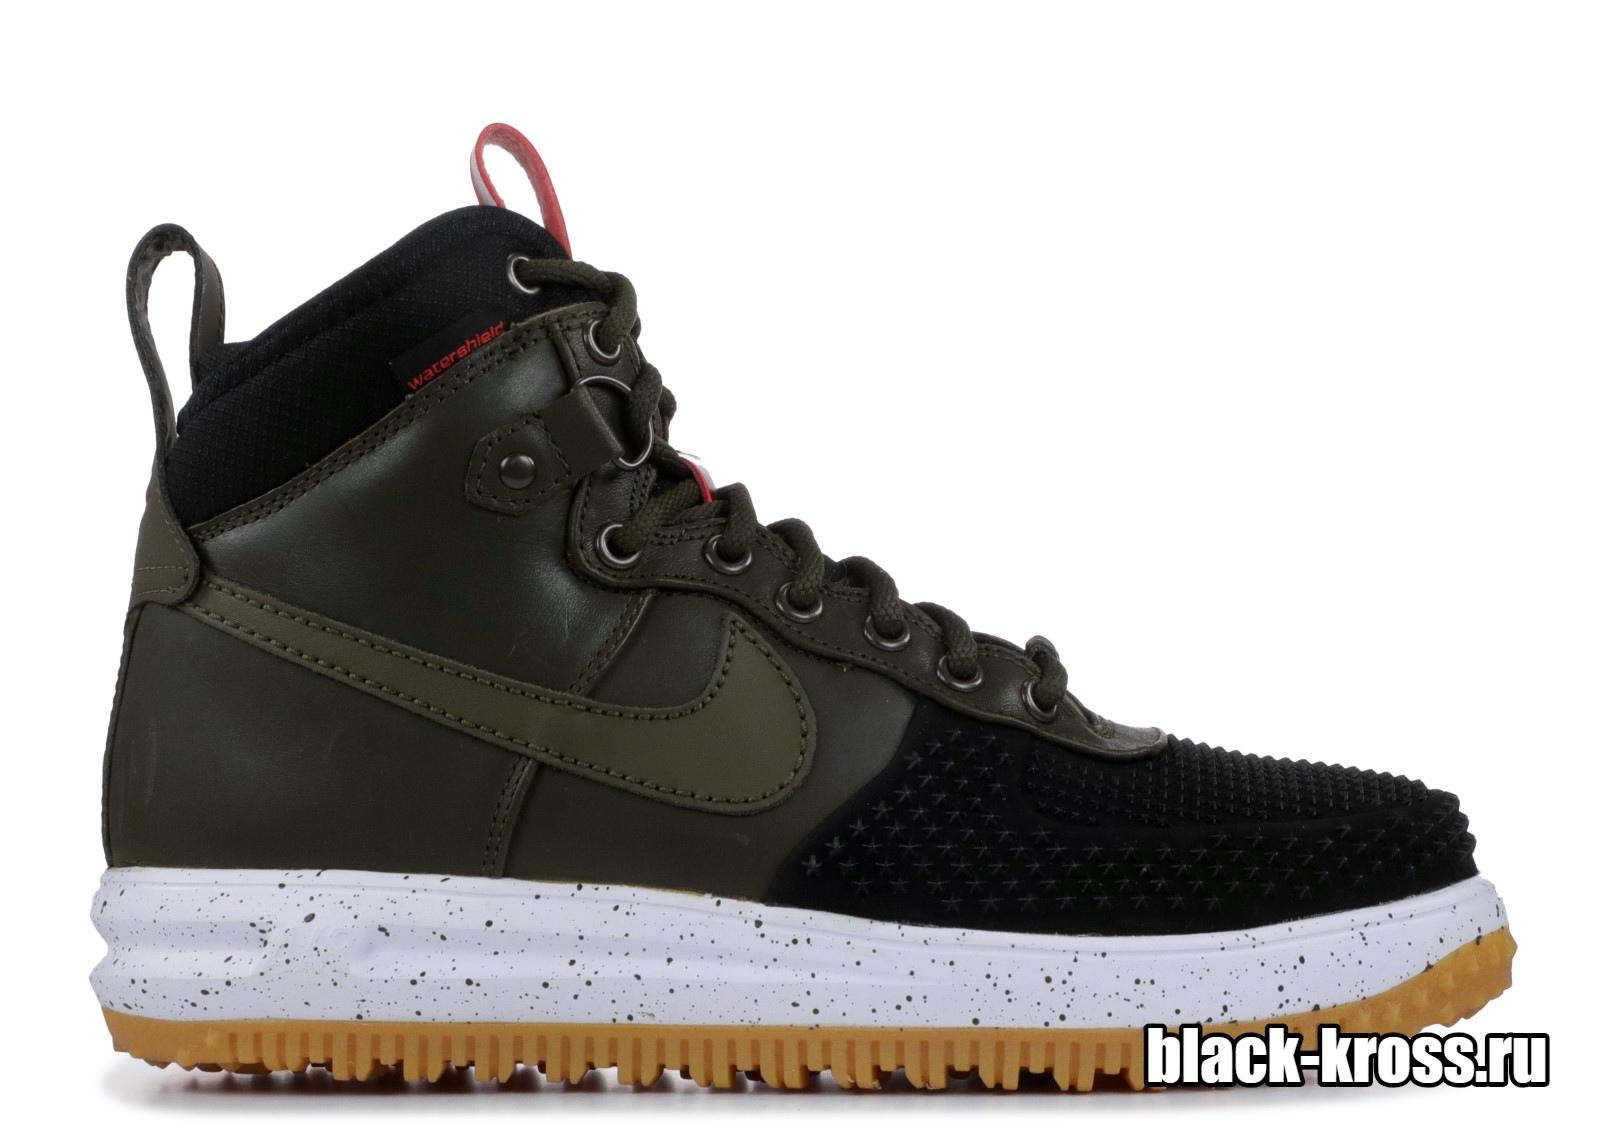 Nike Lunar Force 1 Duckboot Green/Black (41-46)